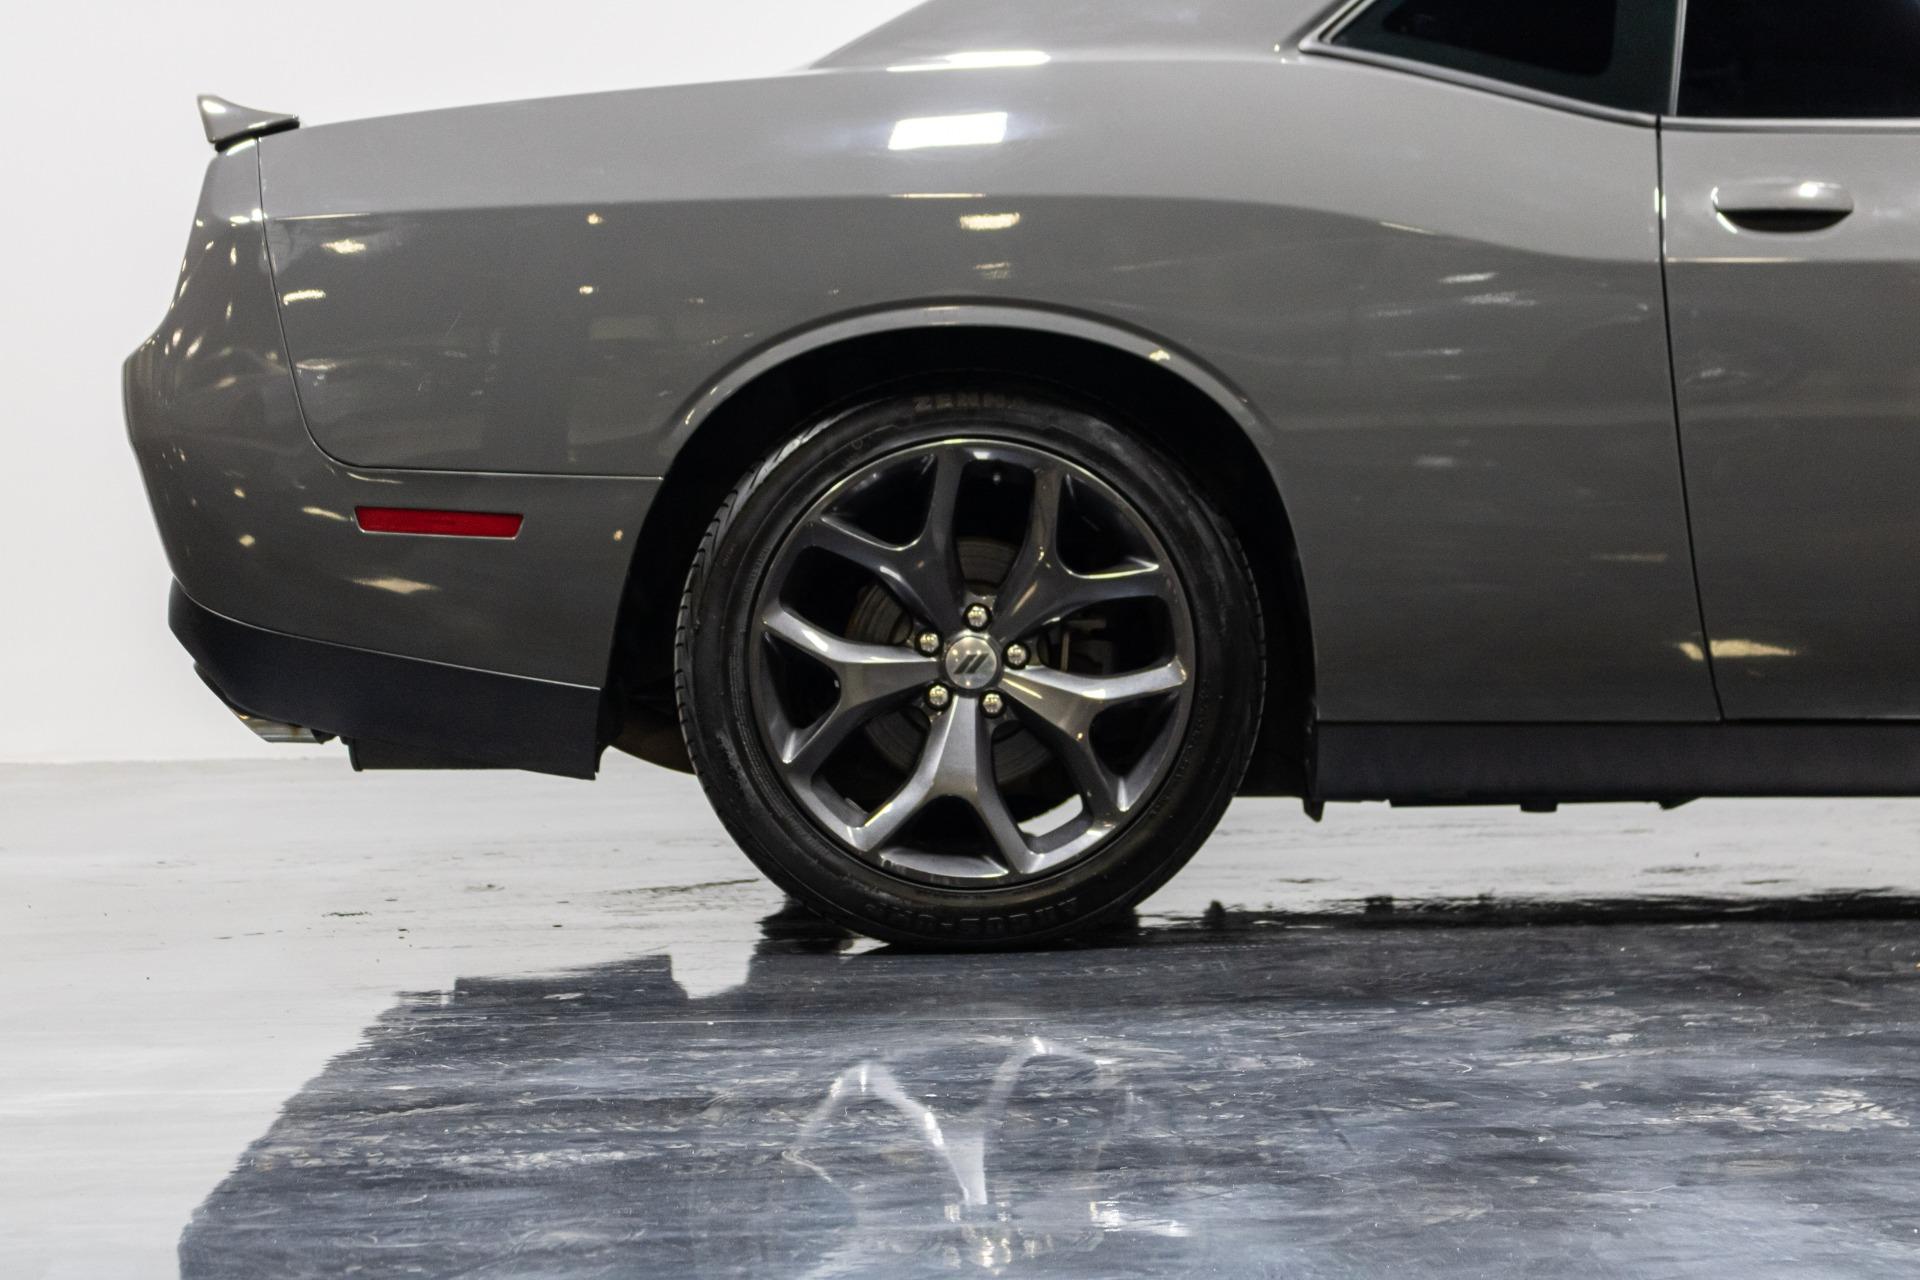 Used 2019 Dodge Challenger RT